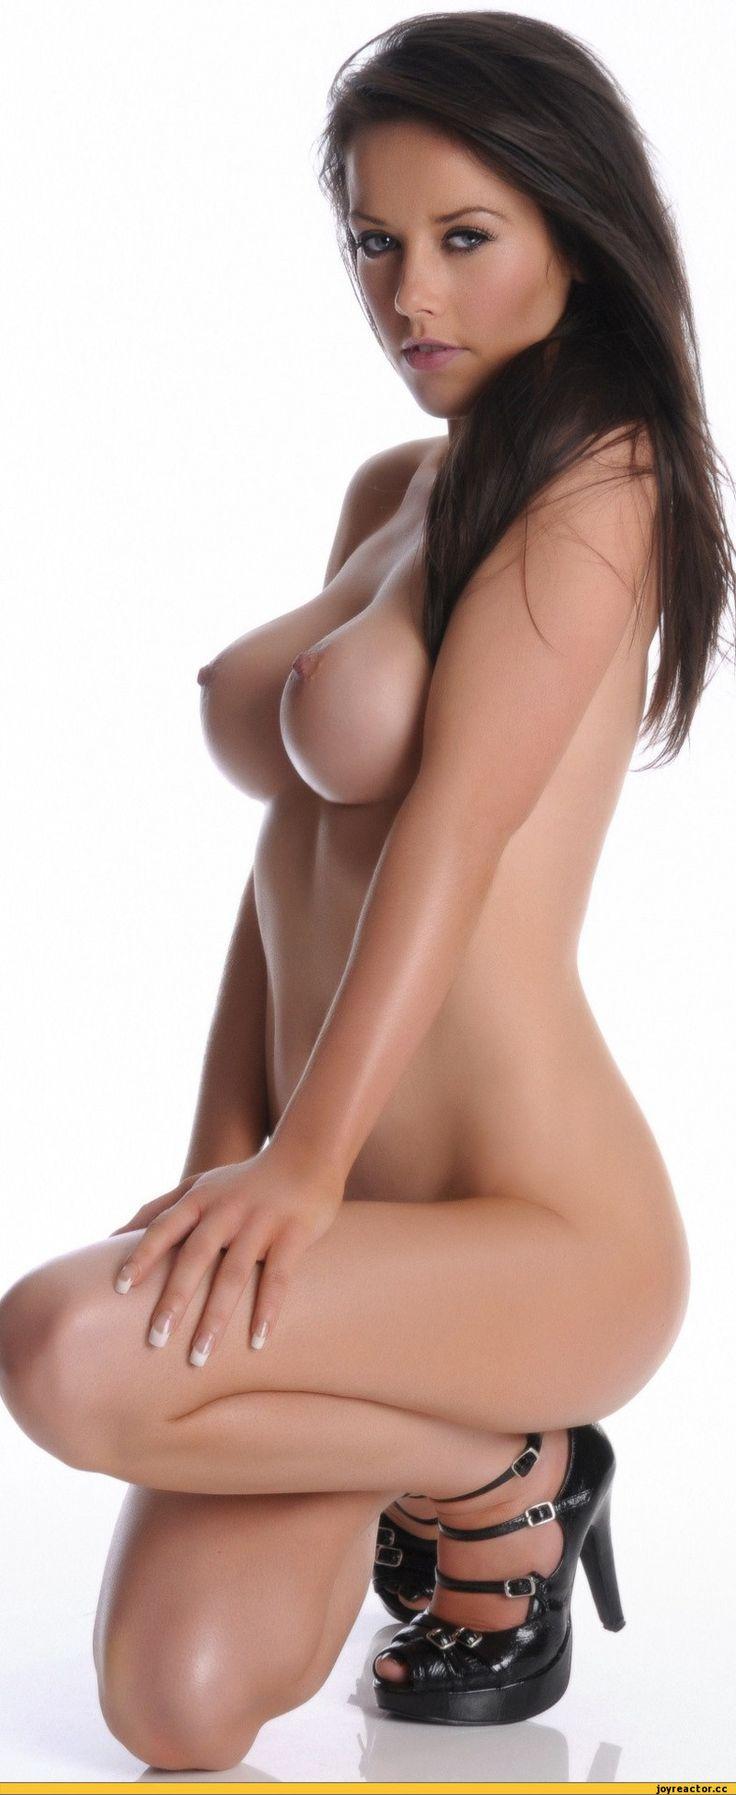 YAPLACAL.COM Nudes